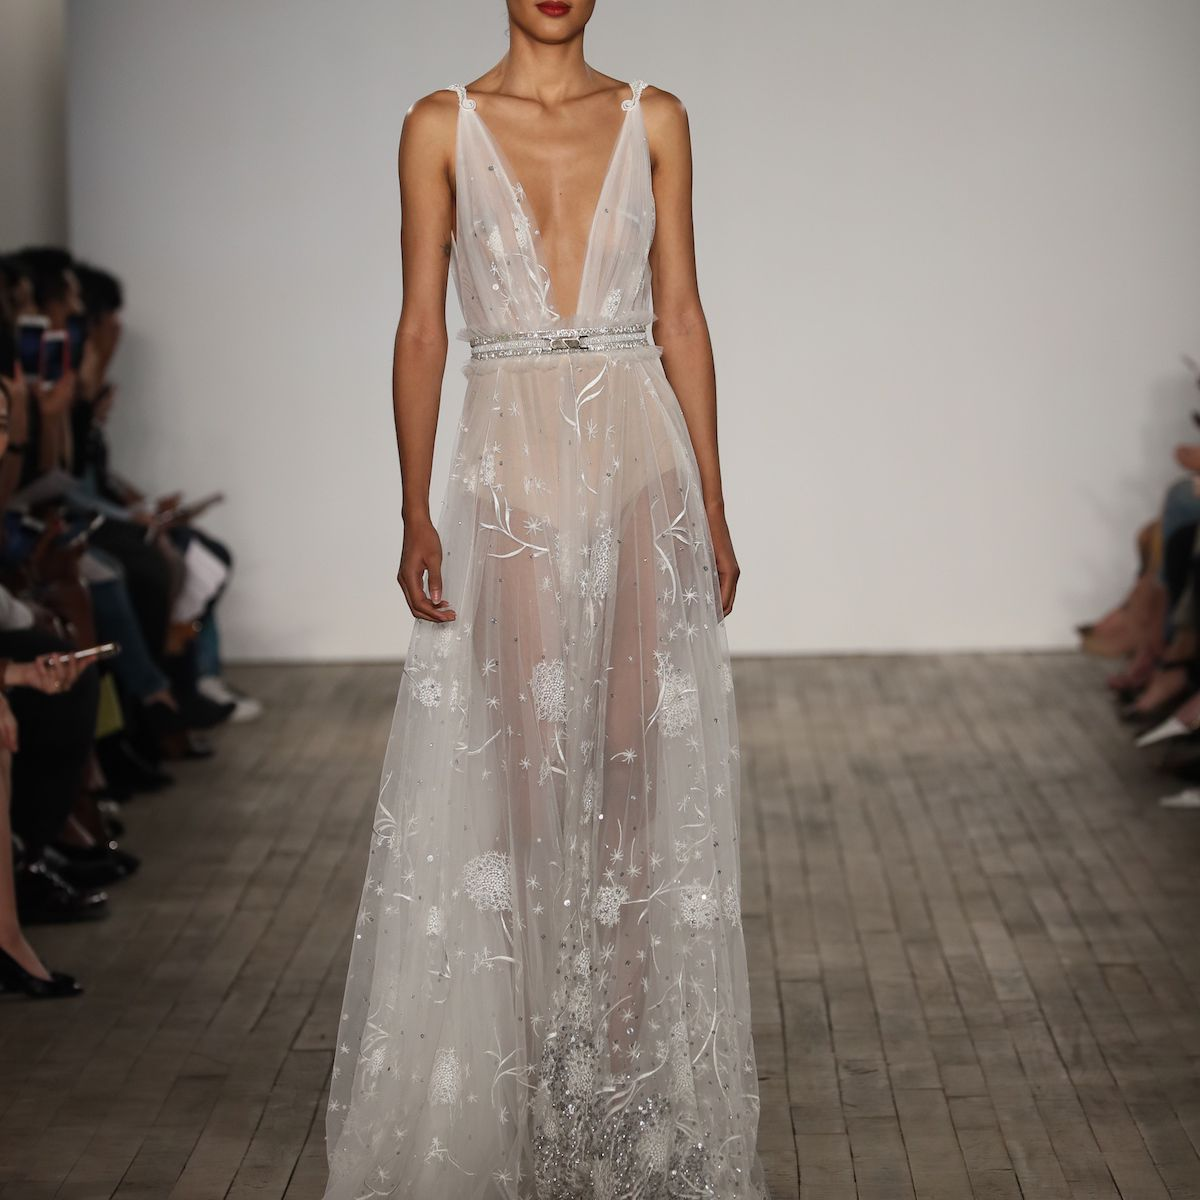 Model in deep V-cut embroidered wedding dress